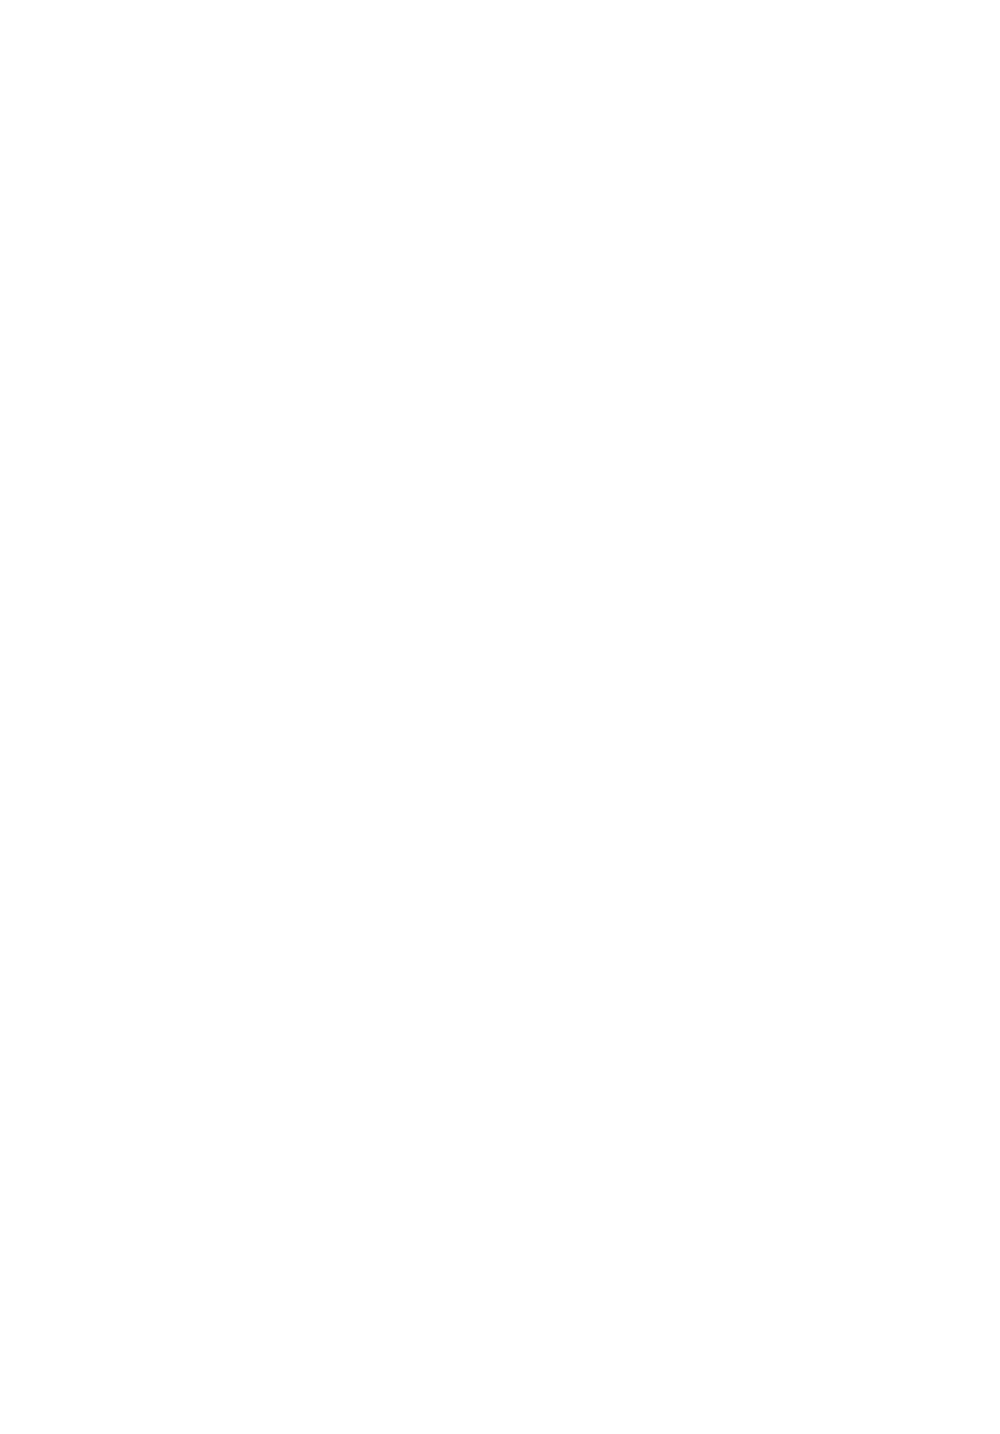 xxxtentacion badvibesforever - Sticker by danirose62